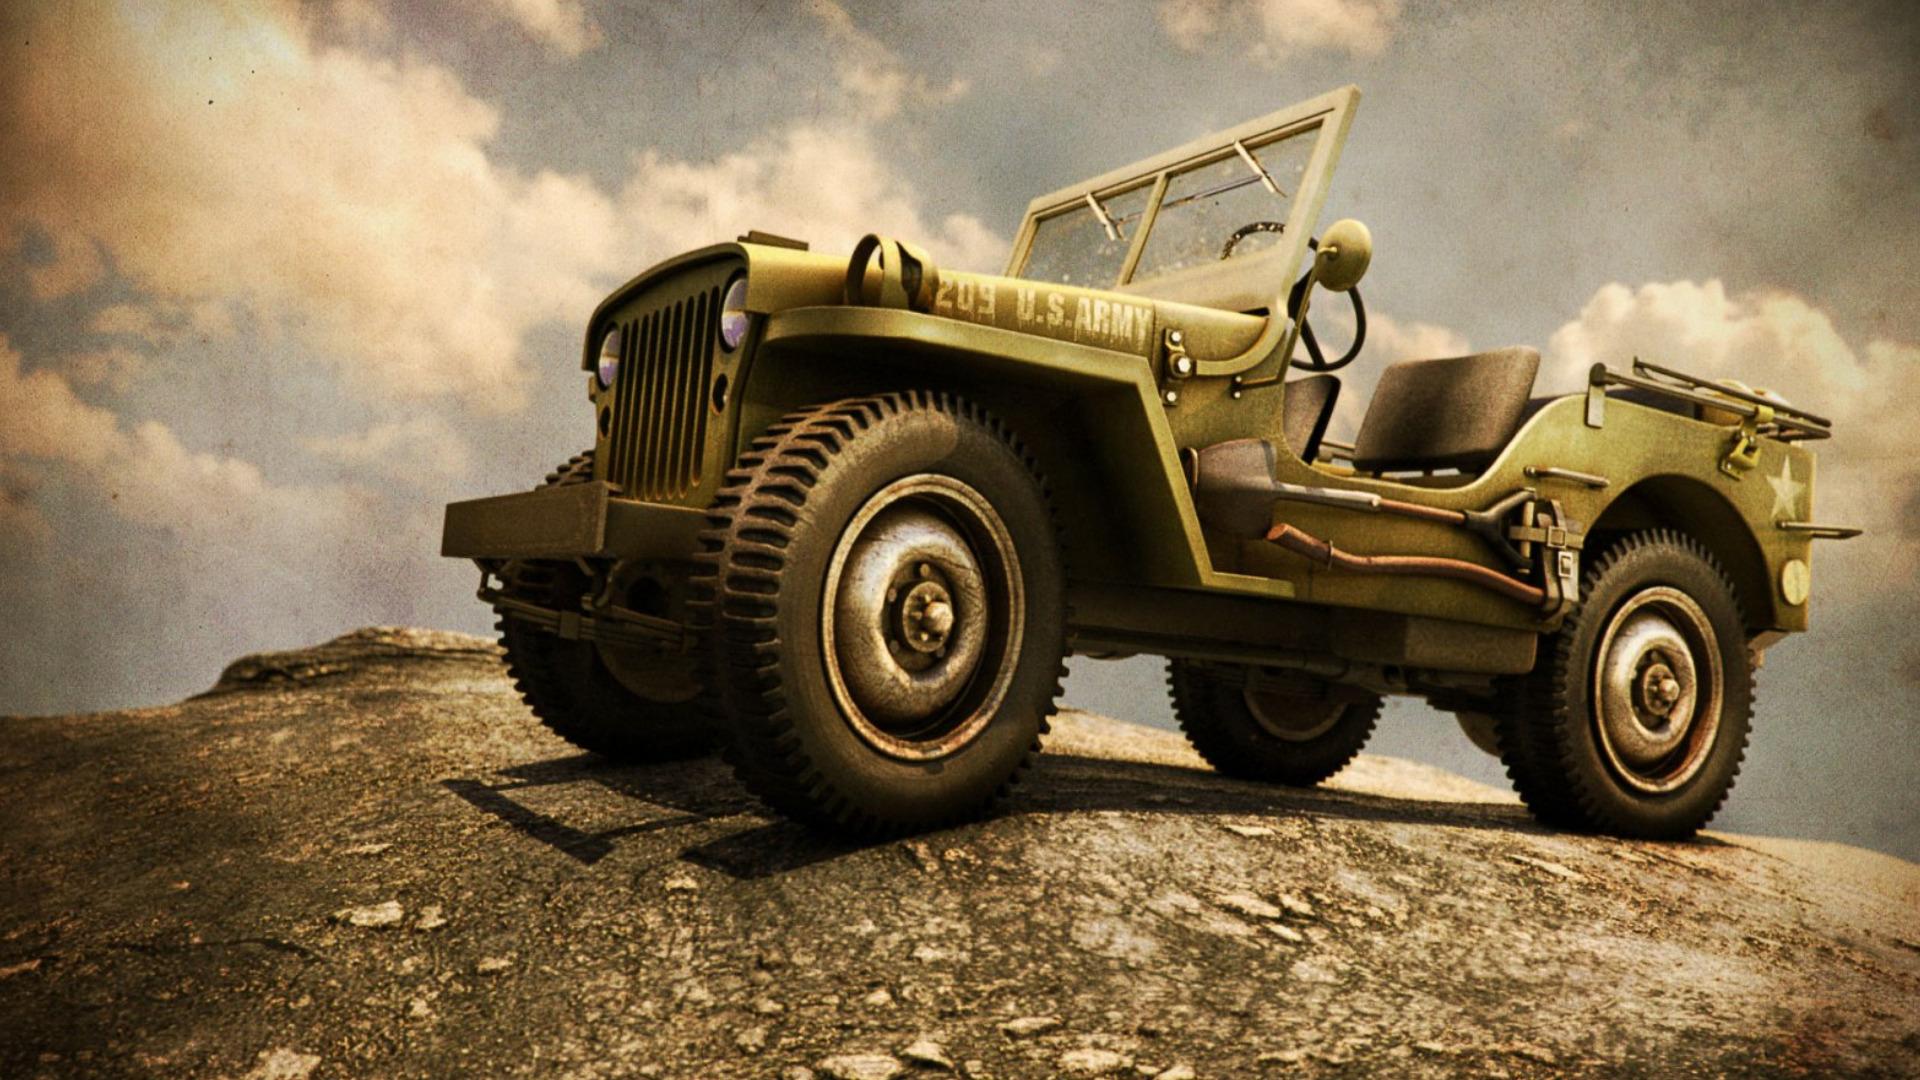 Hd wallpaper vehicle - Military Vehicle Wallpaper